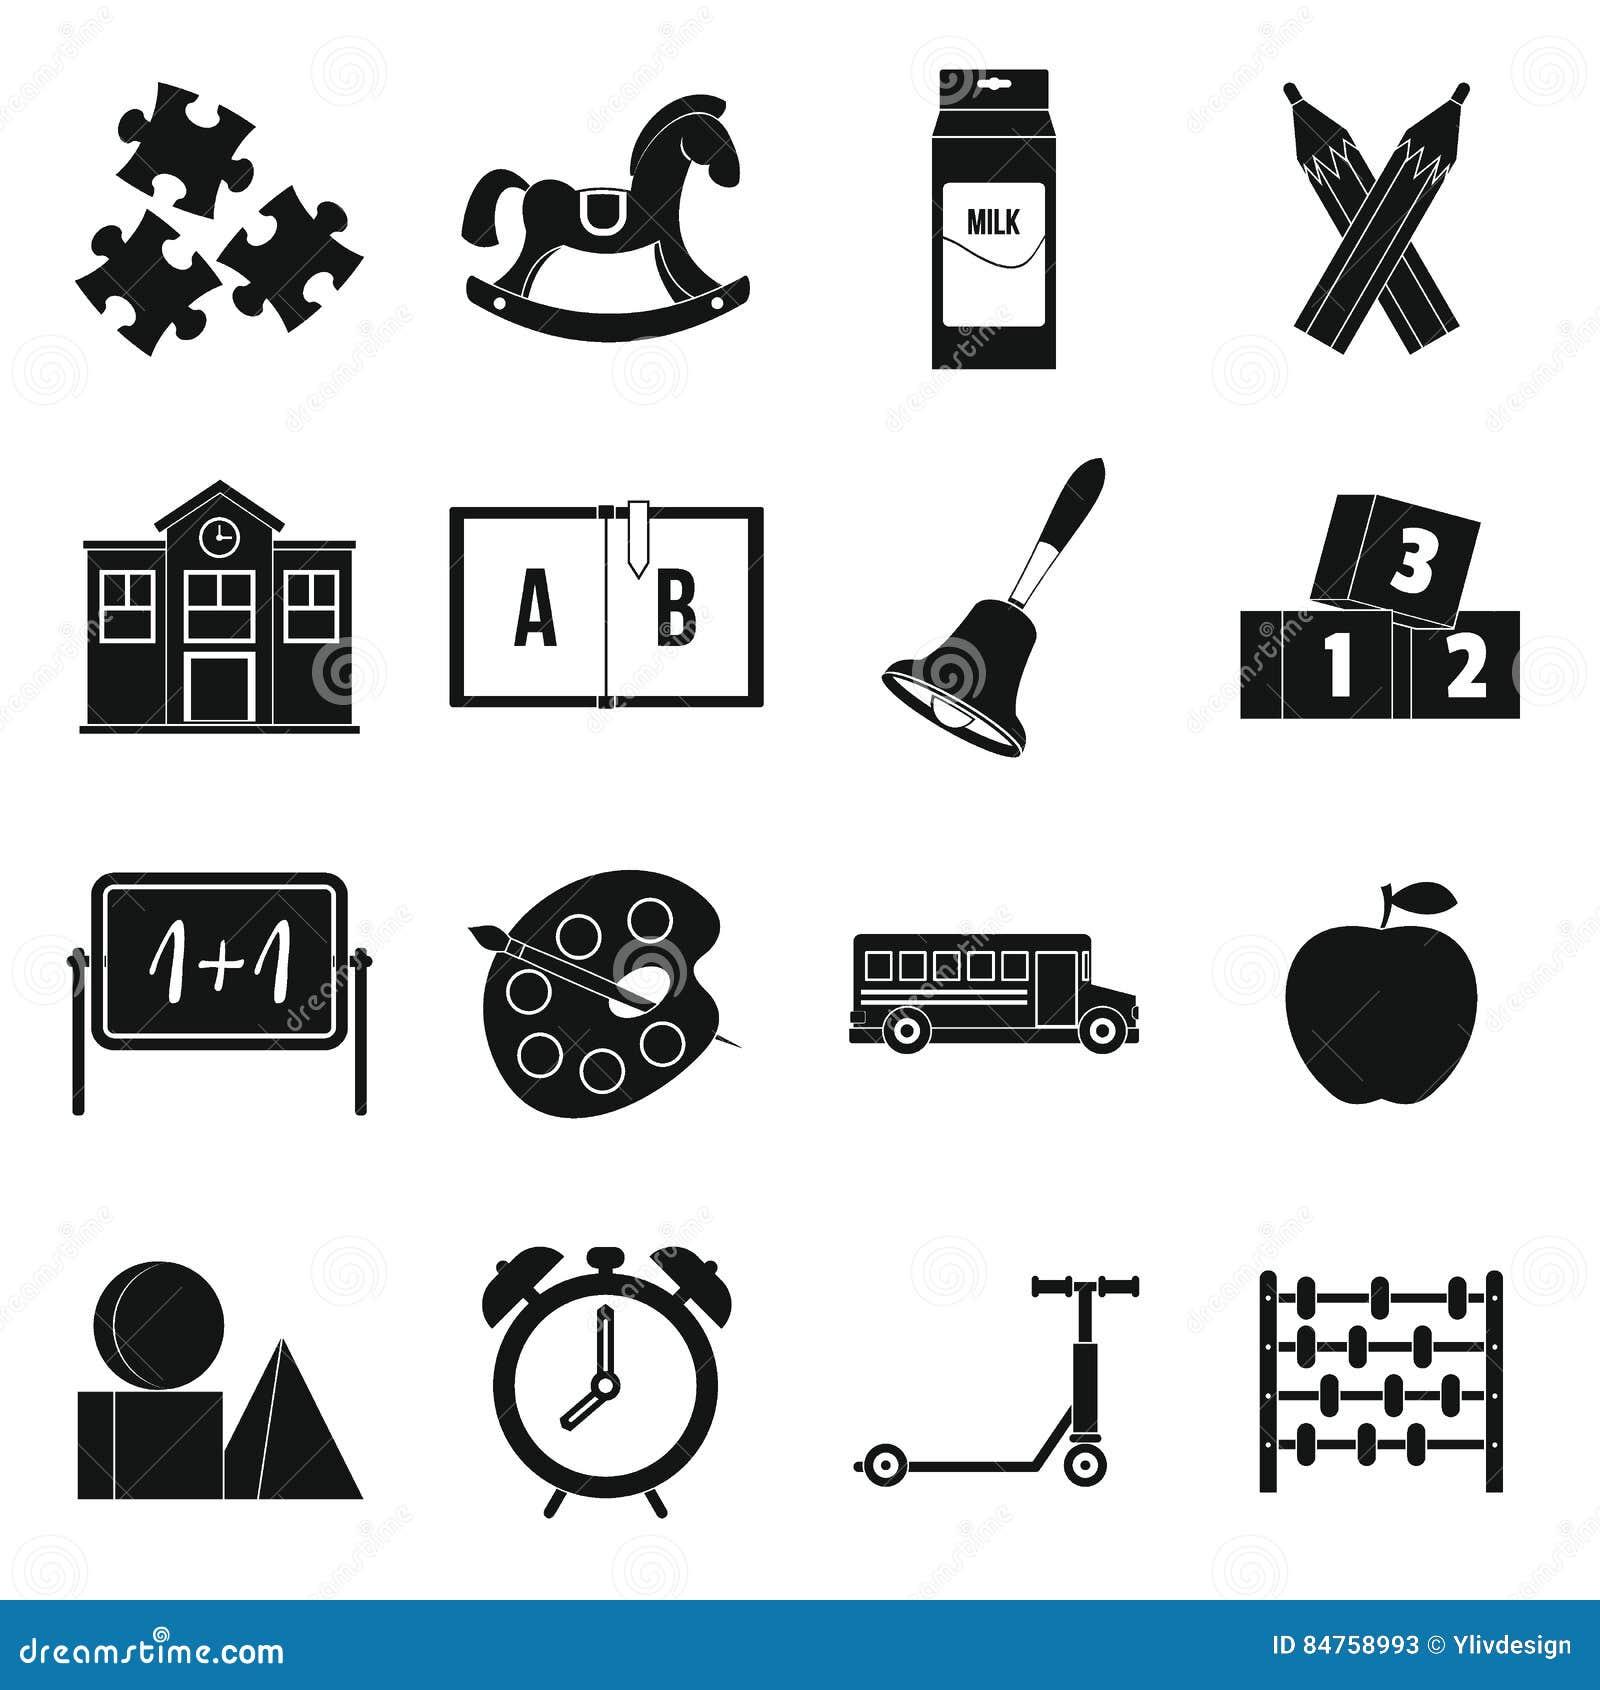 kindergarten symbol icons set simple style stock vector illustration of chalk geometry 84758993. Black Bedroom Furniture Sets. Home Design Ideas